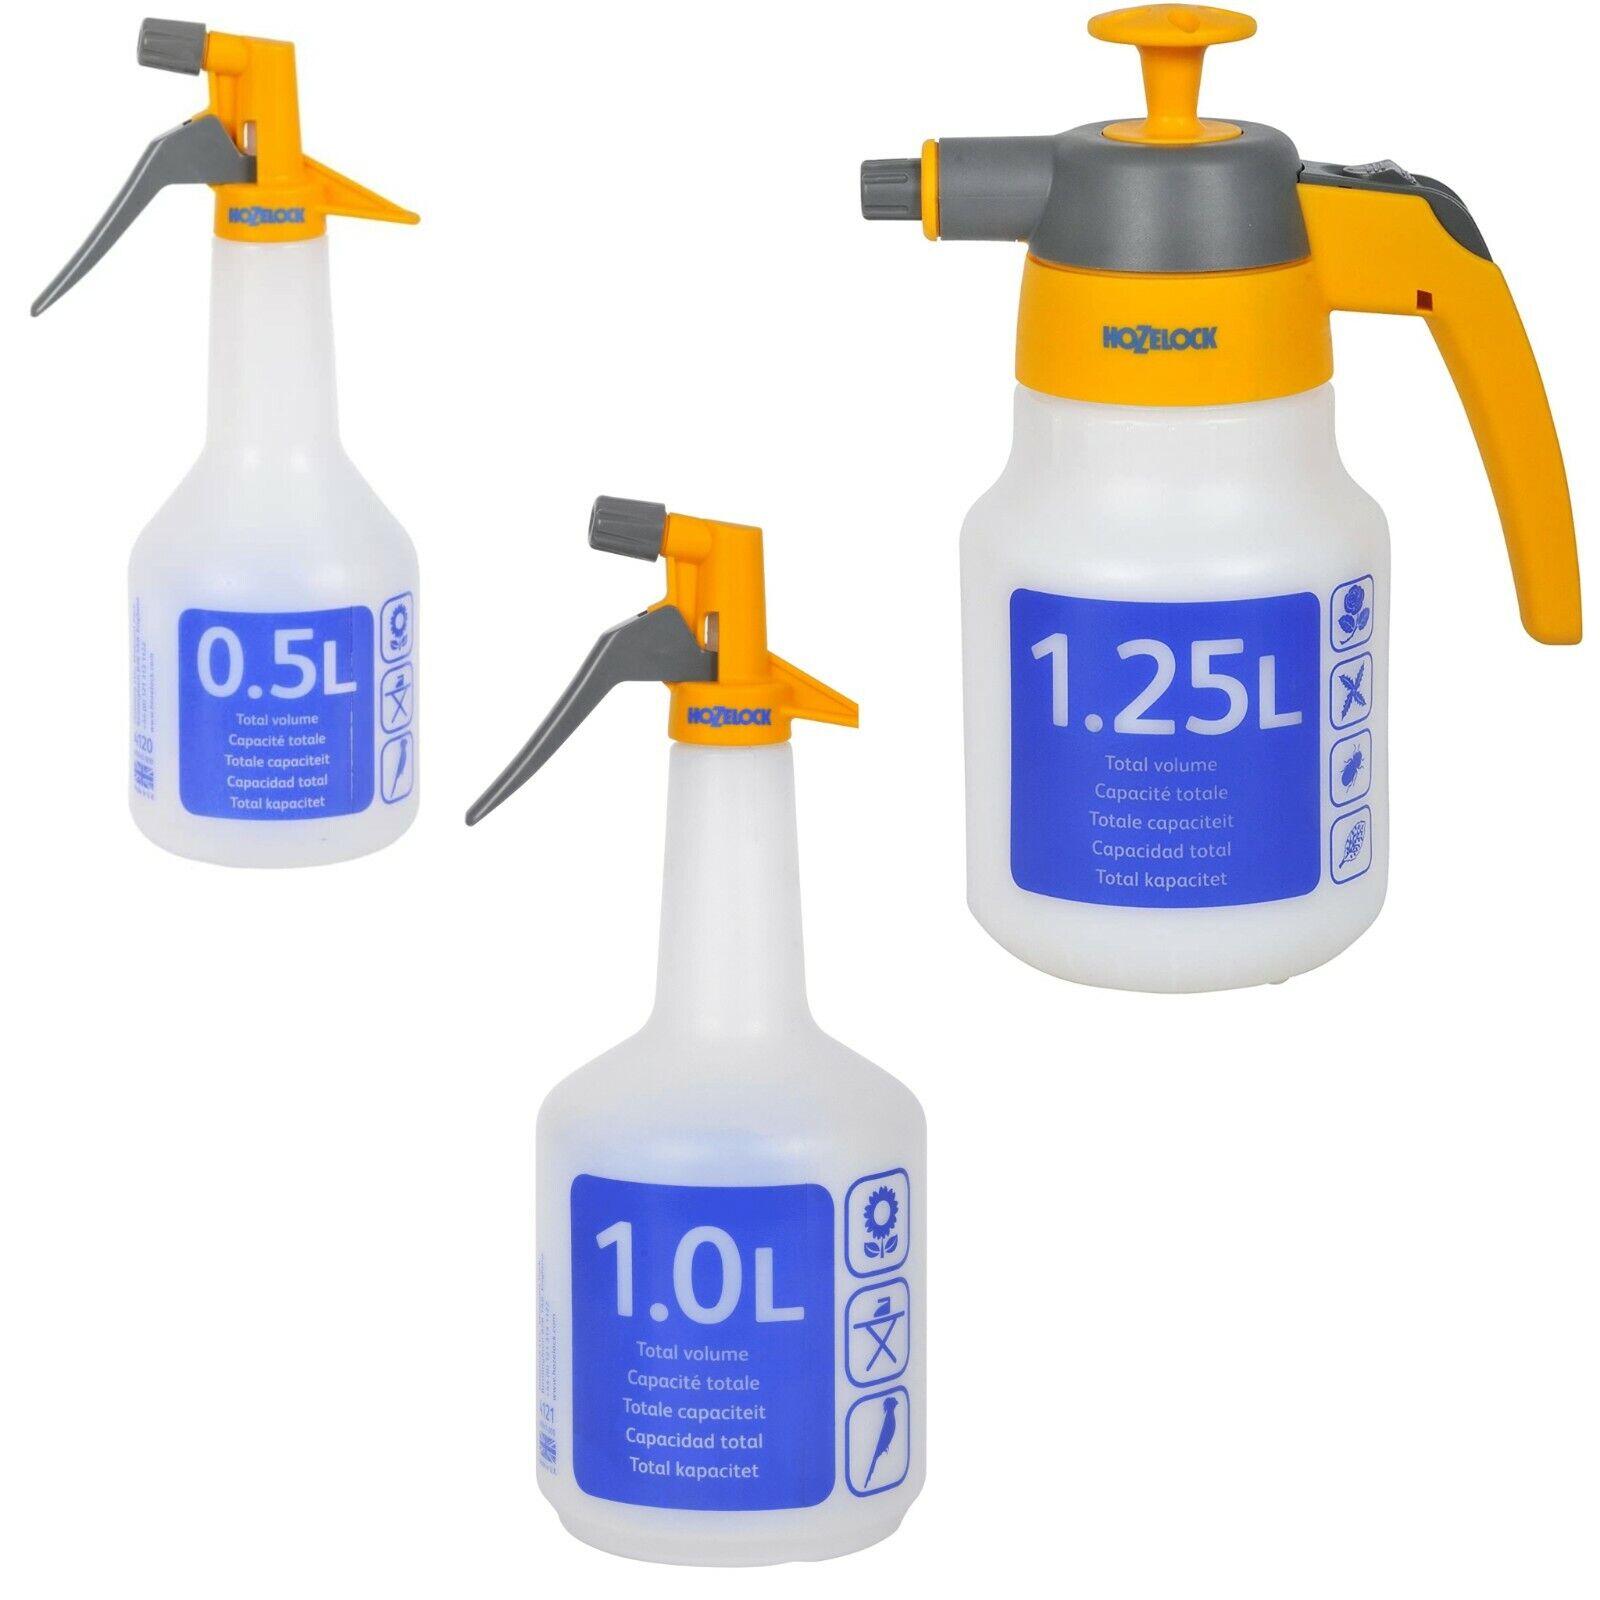 Hozelock Trigger Water Sprayer Hand Spray Bottle Plants Garden Cleaning Flowers